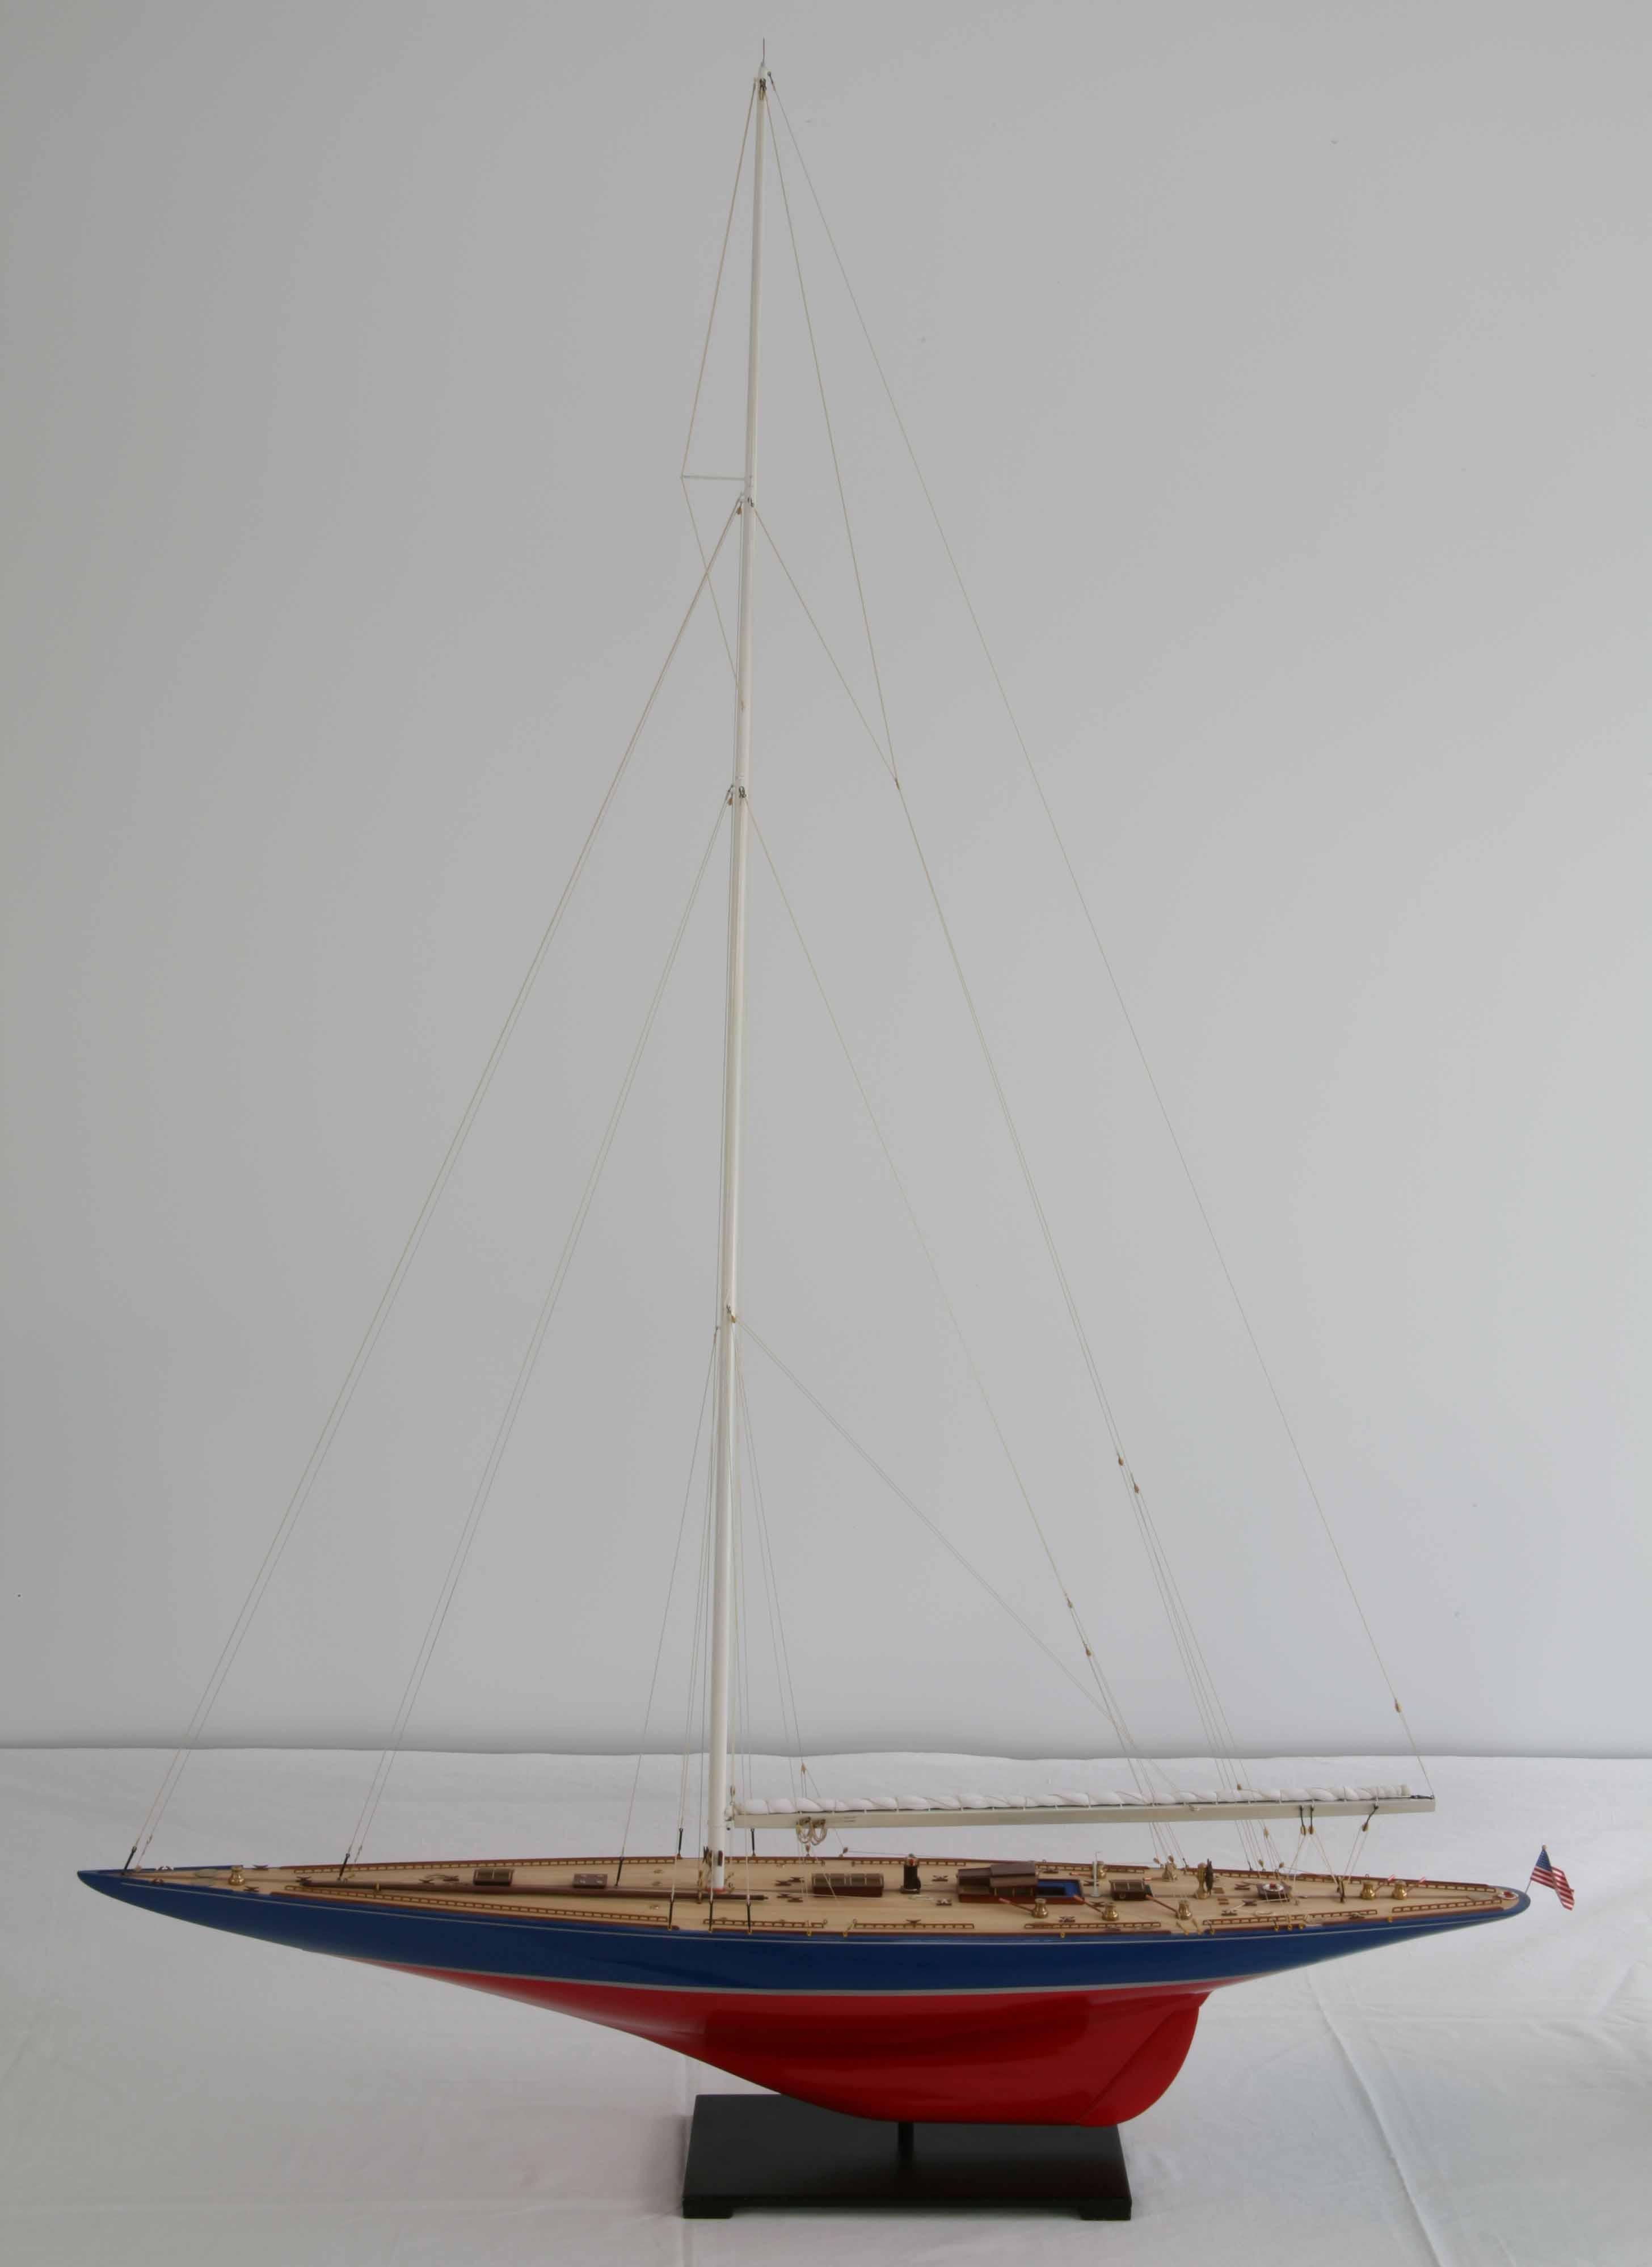 Ship model - J-Class Yacht Endeavour of 1934